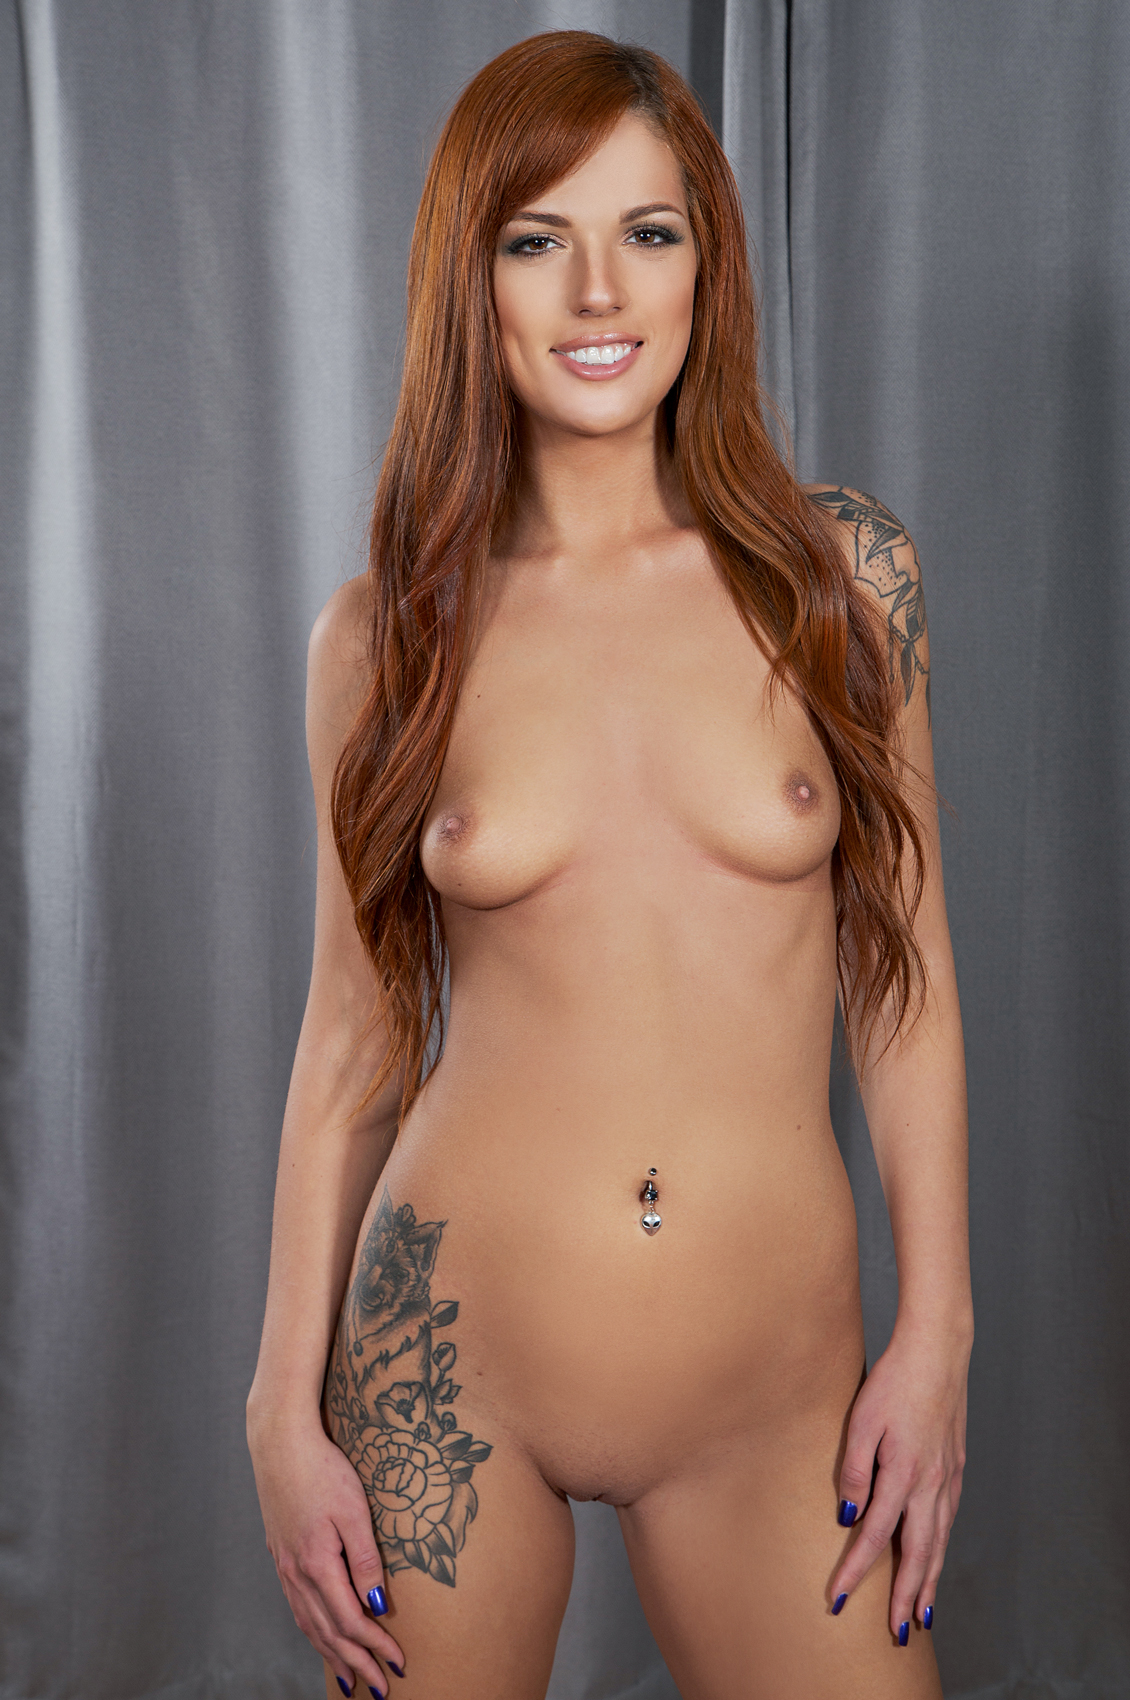 Scarlett Mae's VR Porn Videos, Bio & Free Nude Pics